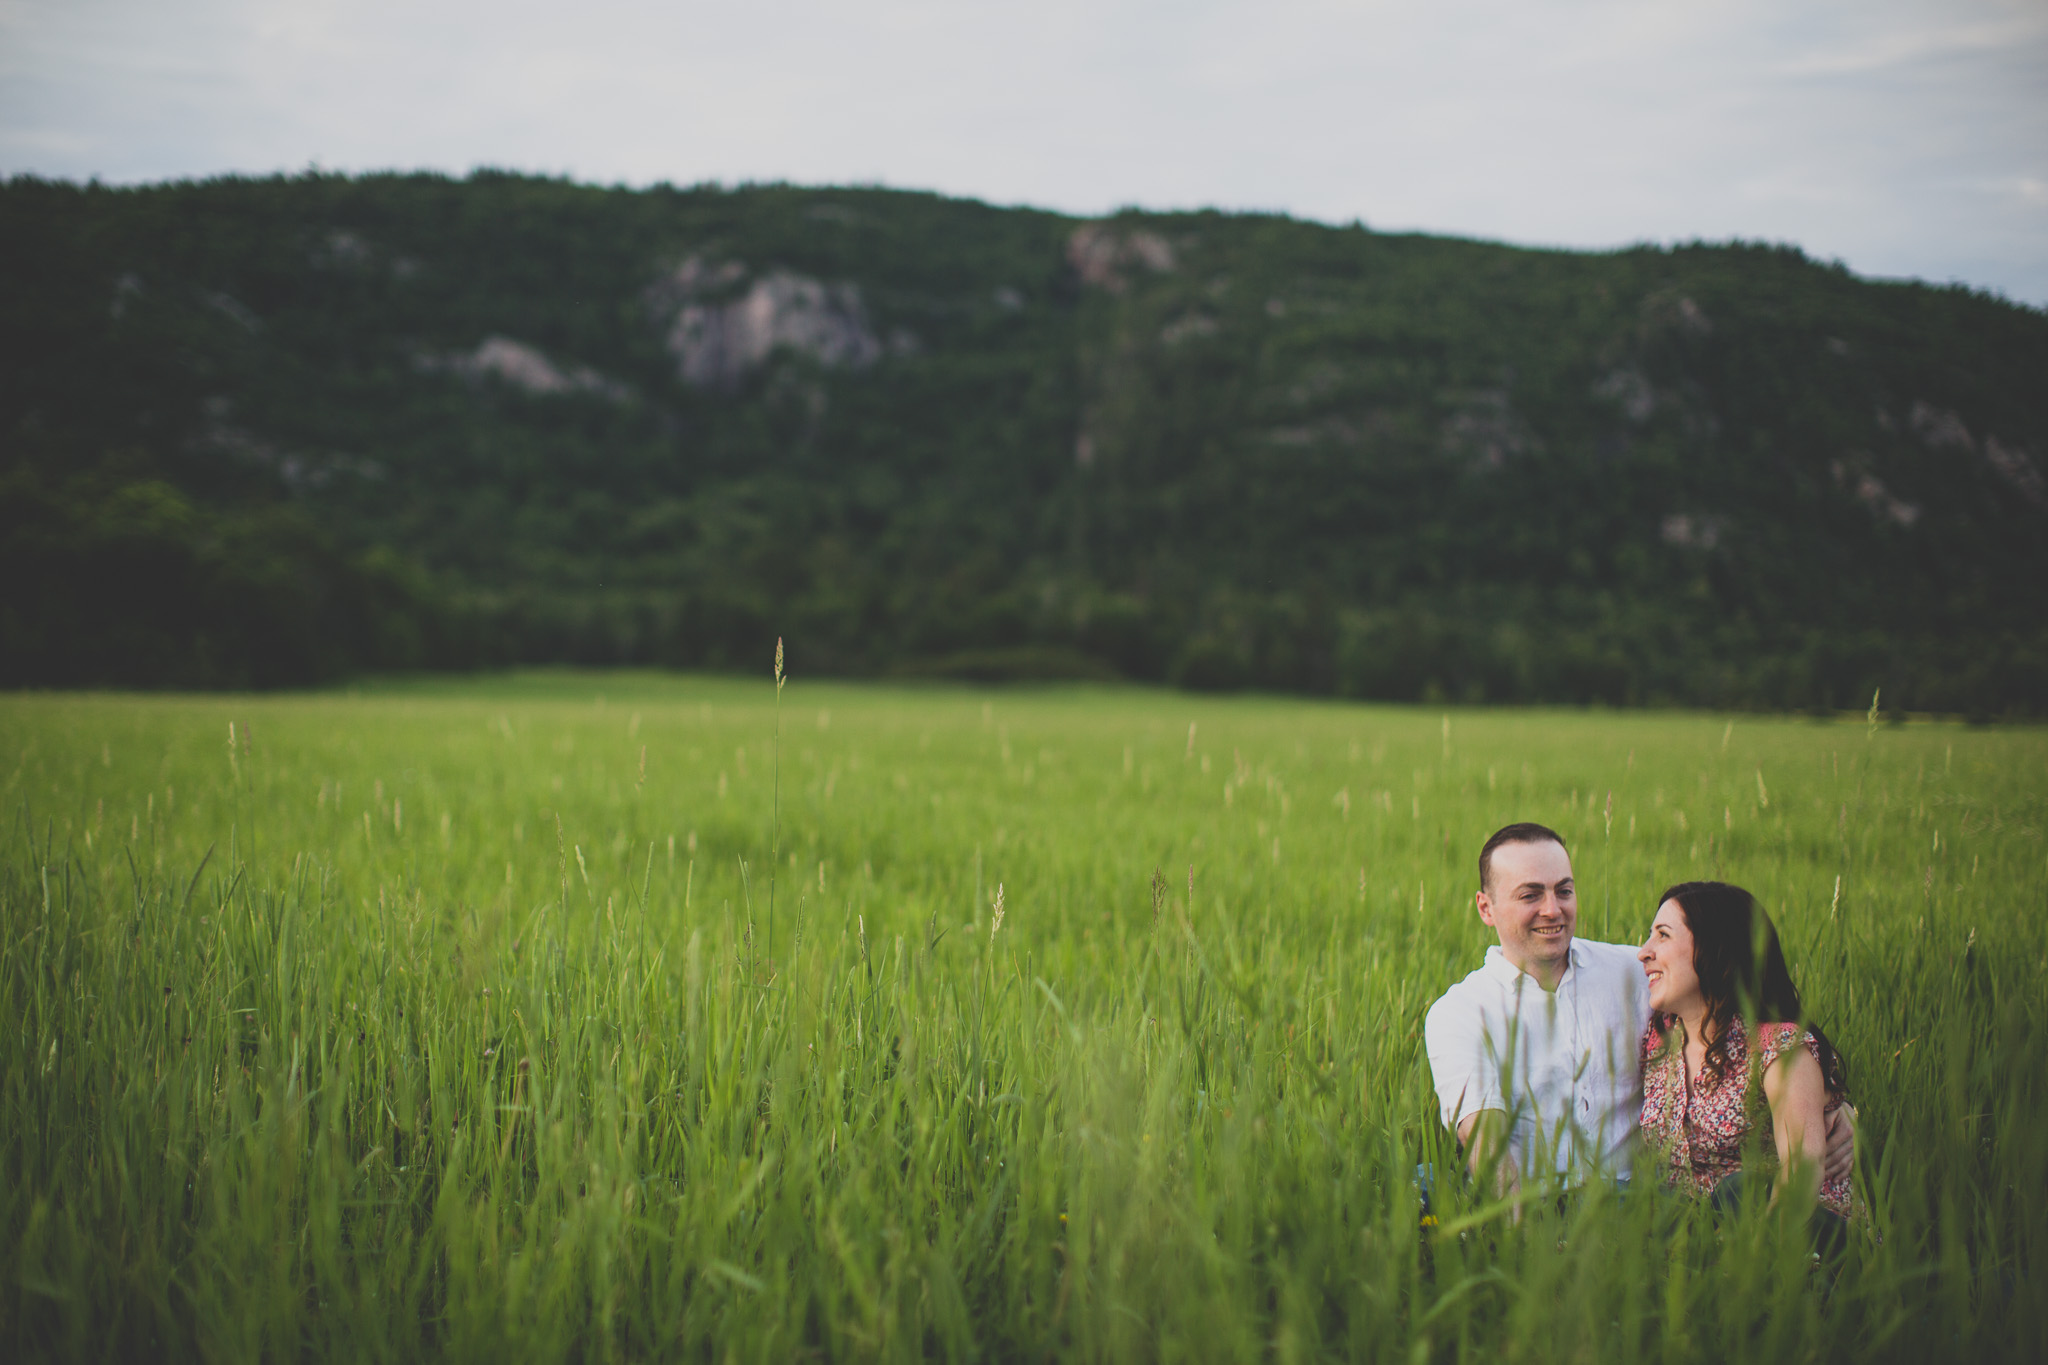 creative-nature-engagement-photo